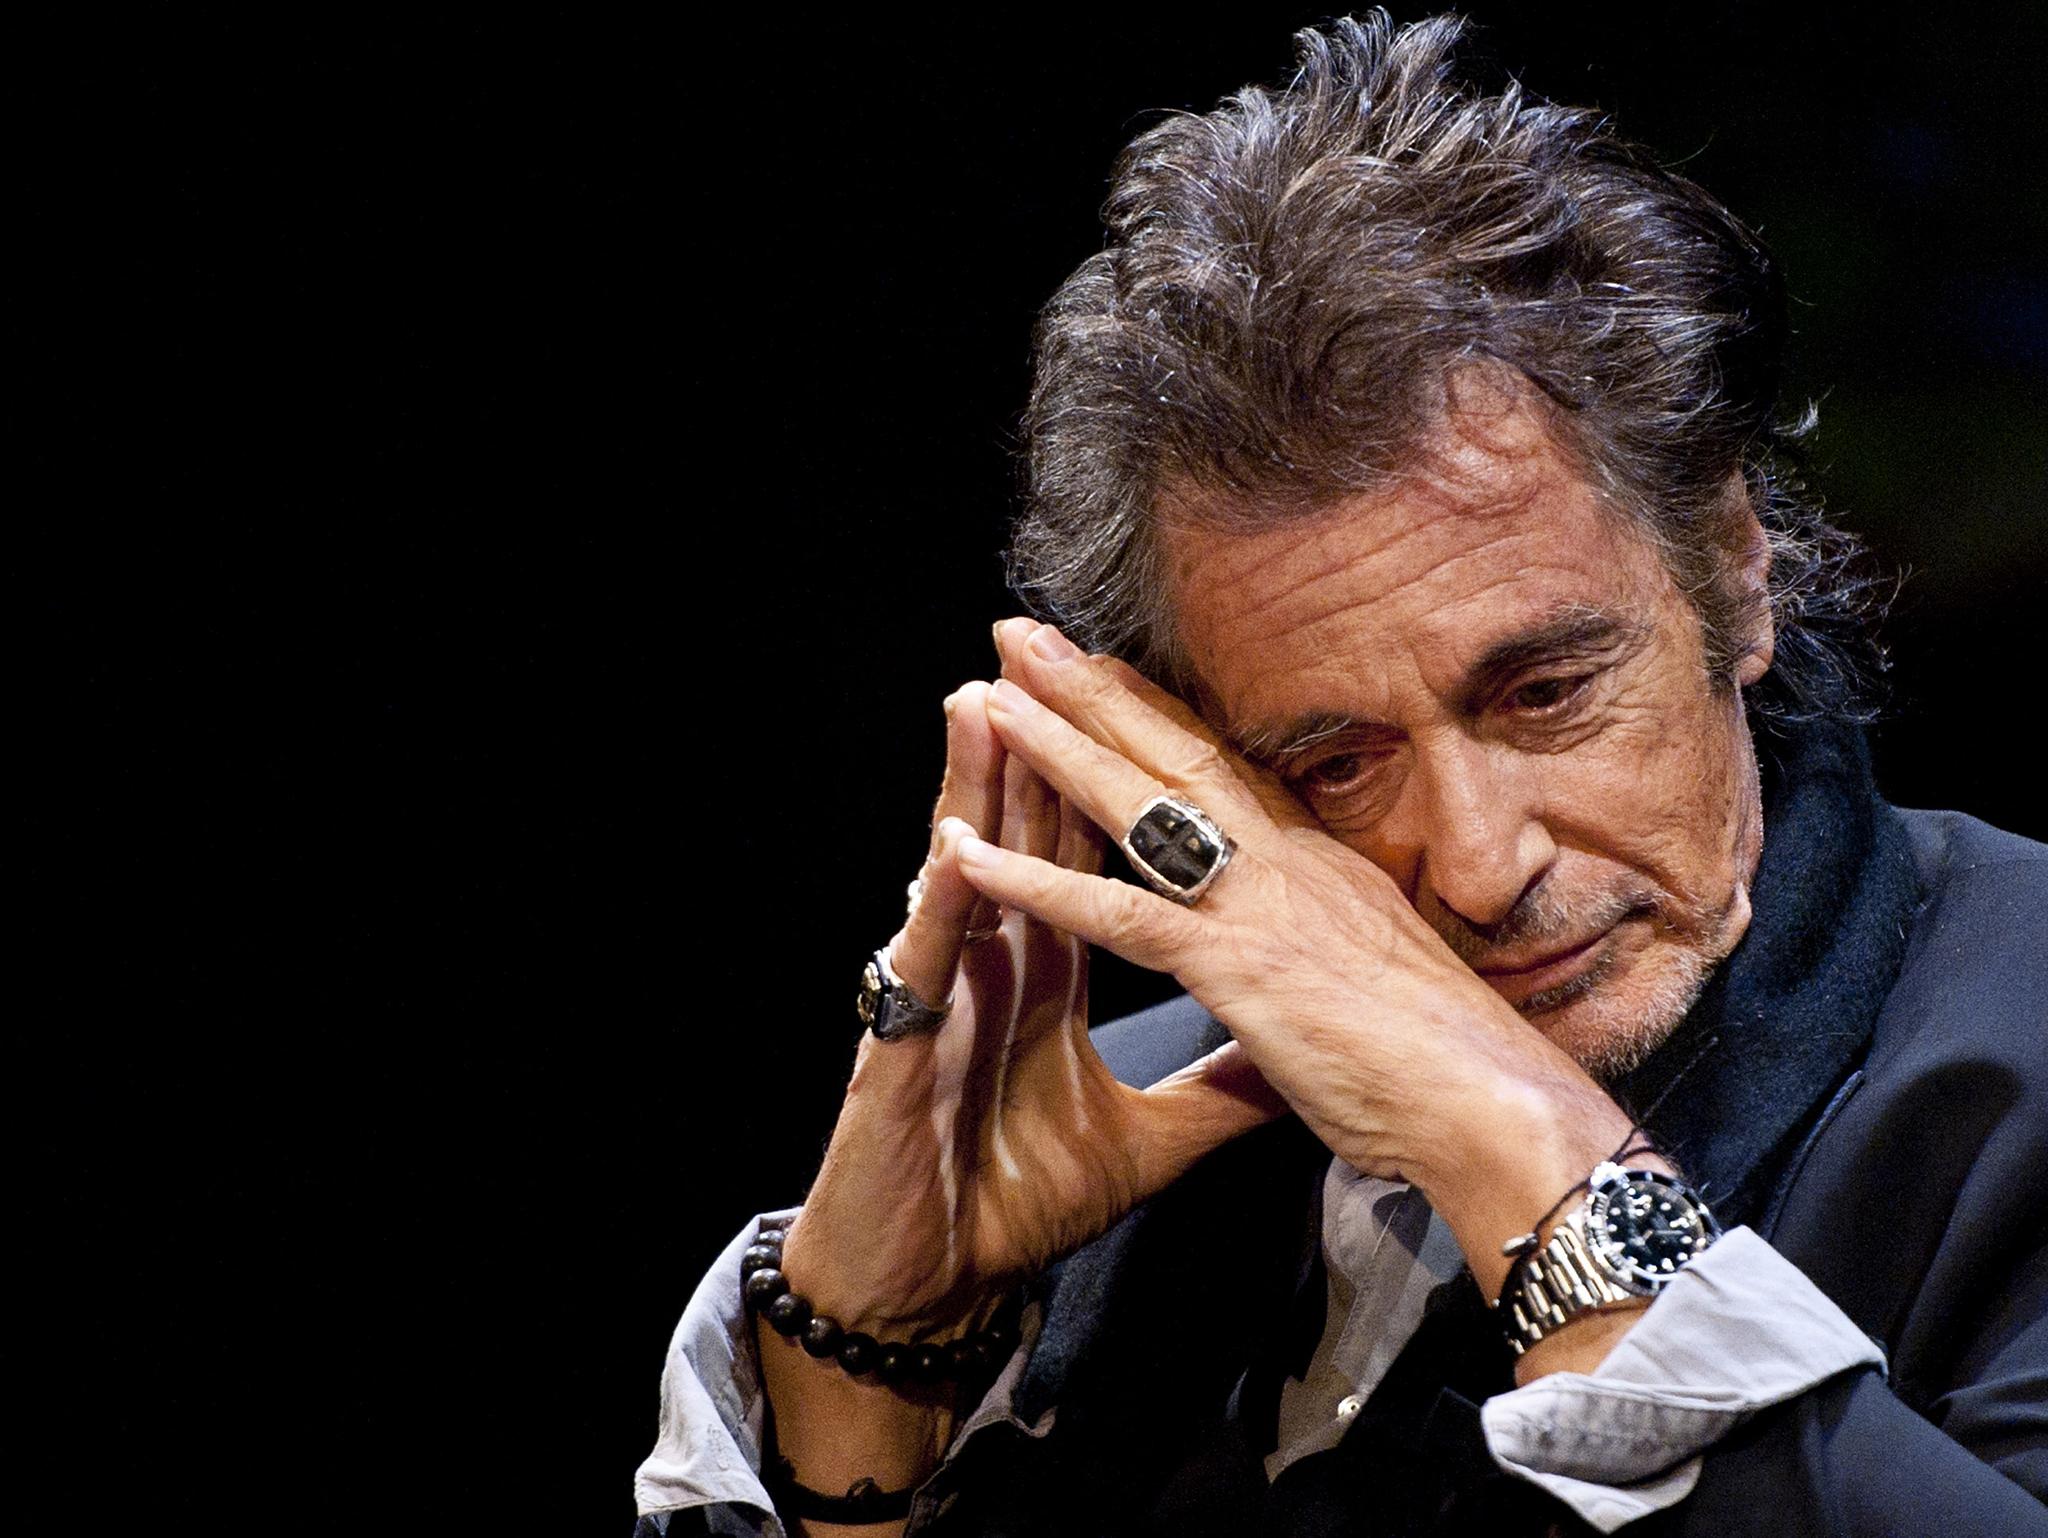 Al Pacino In Star Wars As Han Solo? It Almost Happened